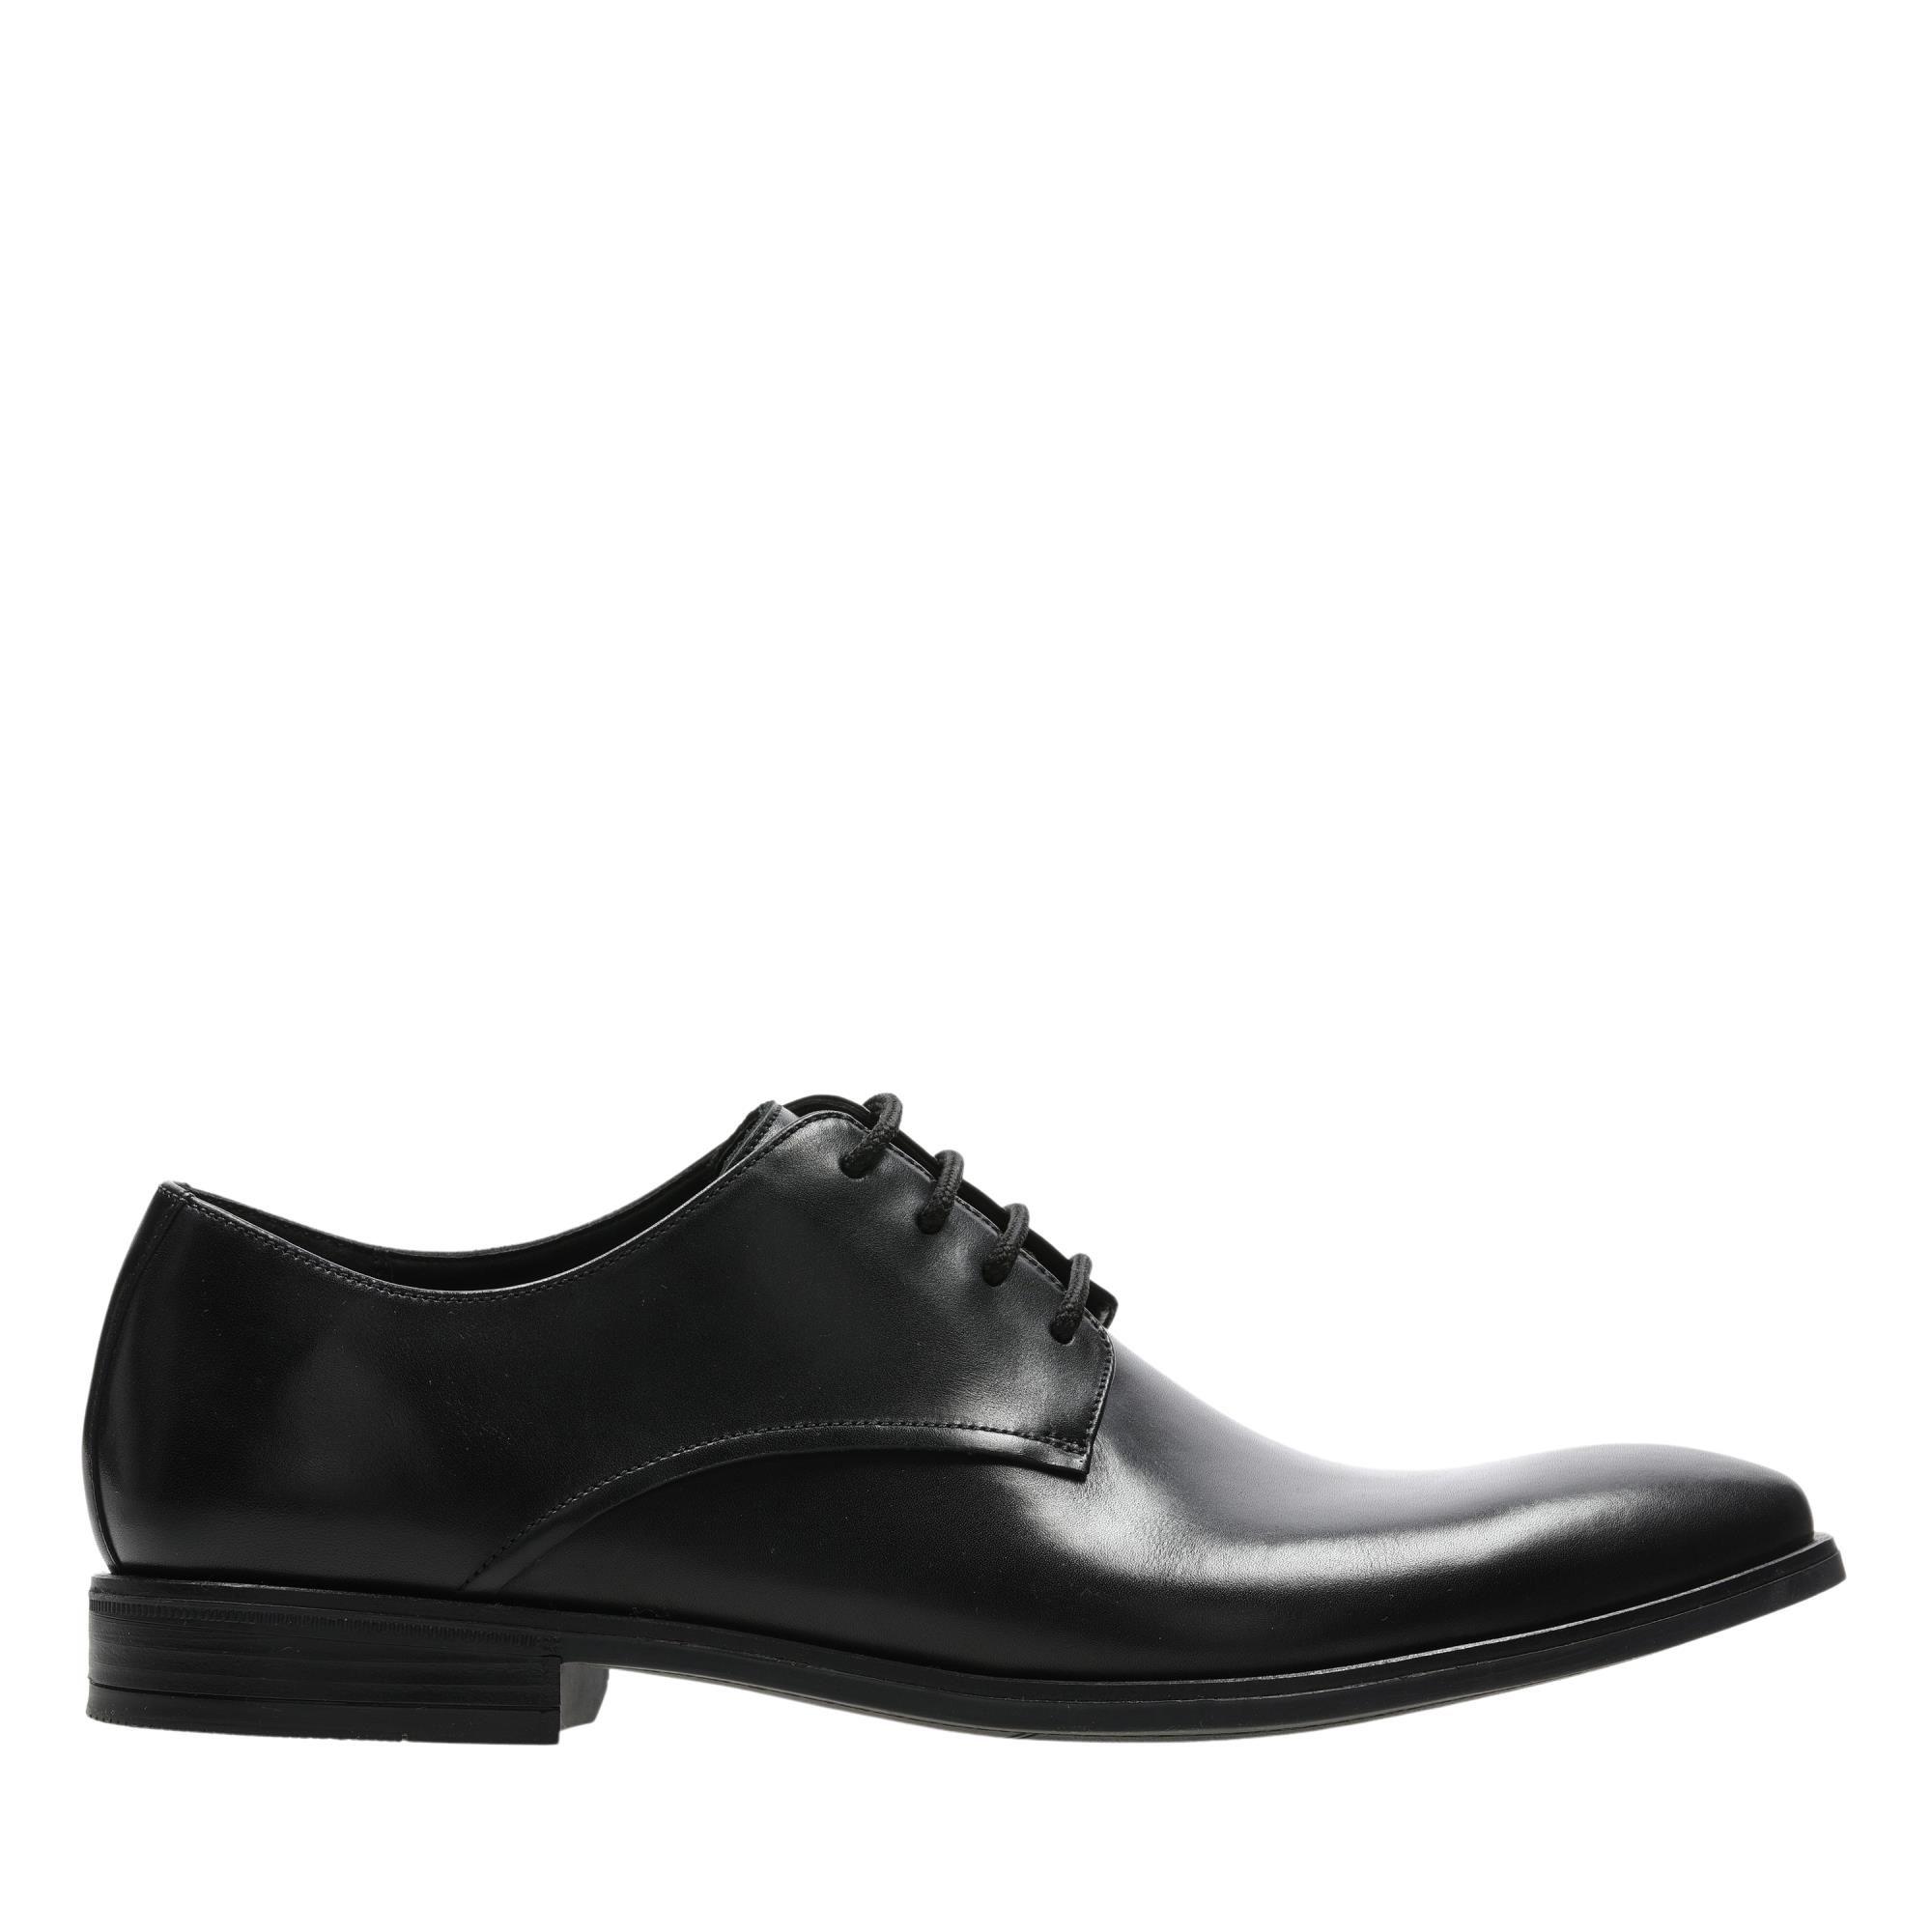 Clarks Stanford Walk 26147893 Black Leather